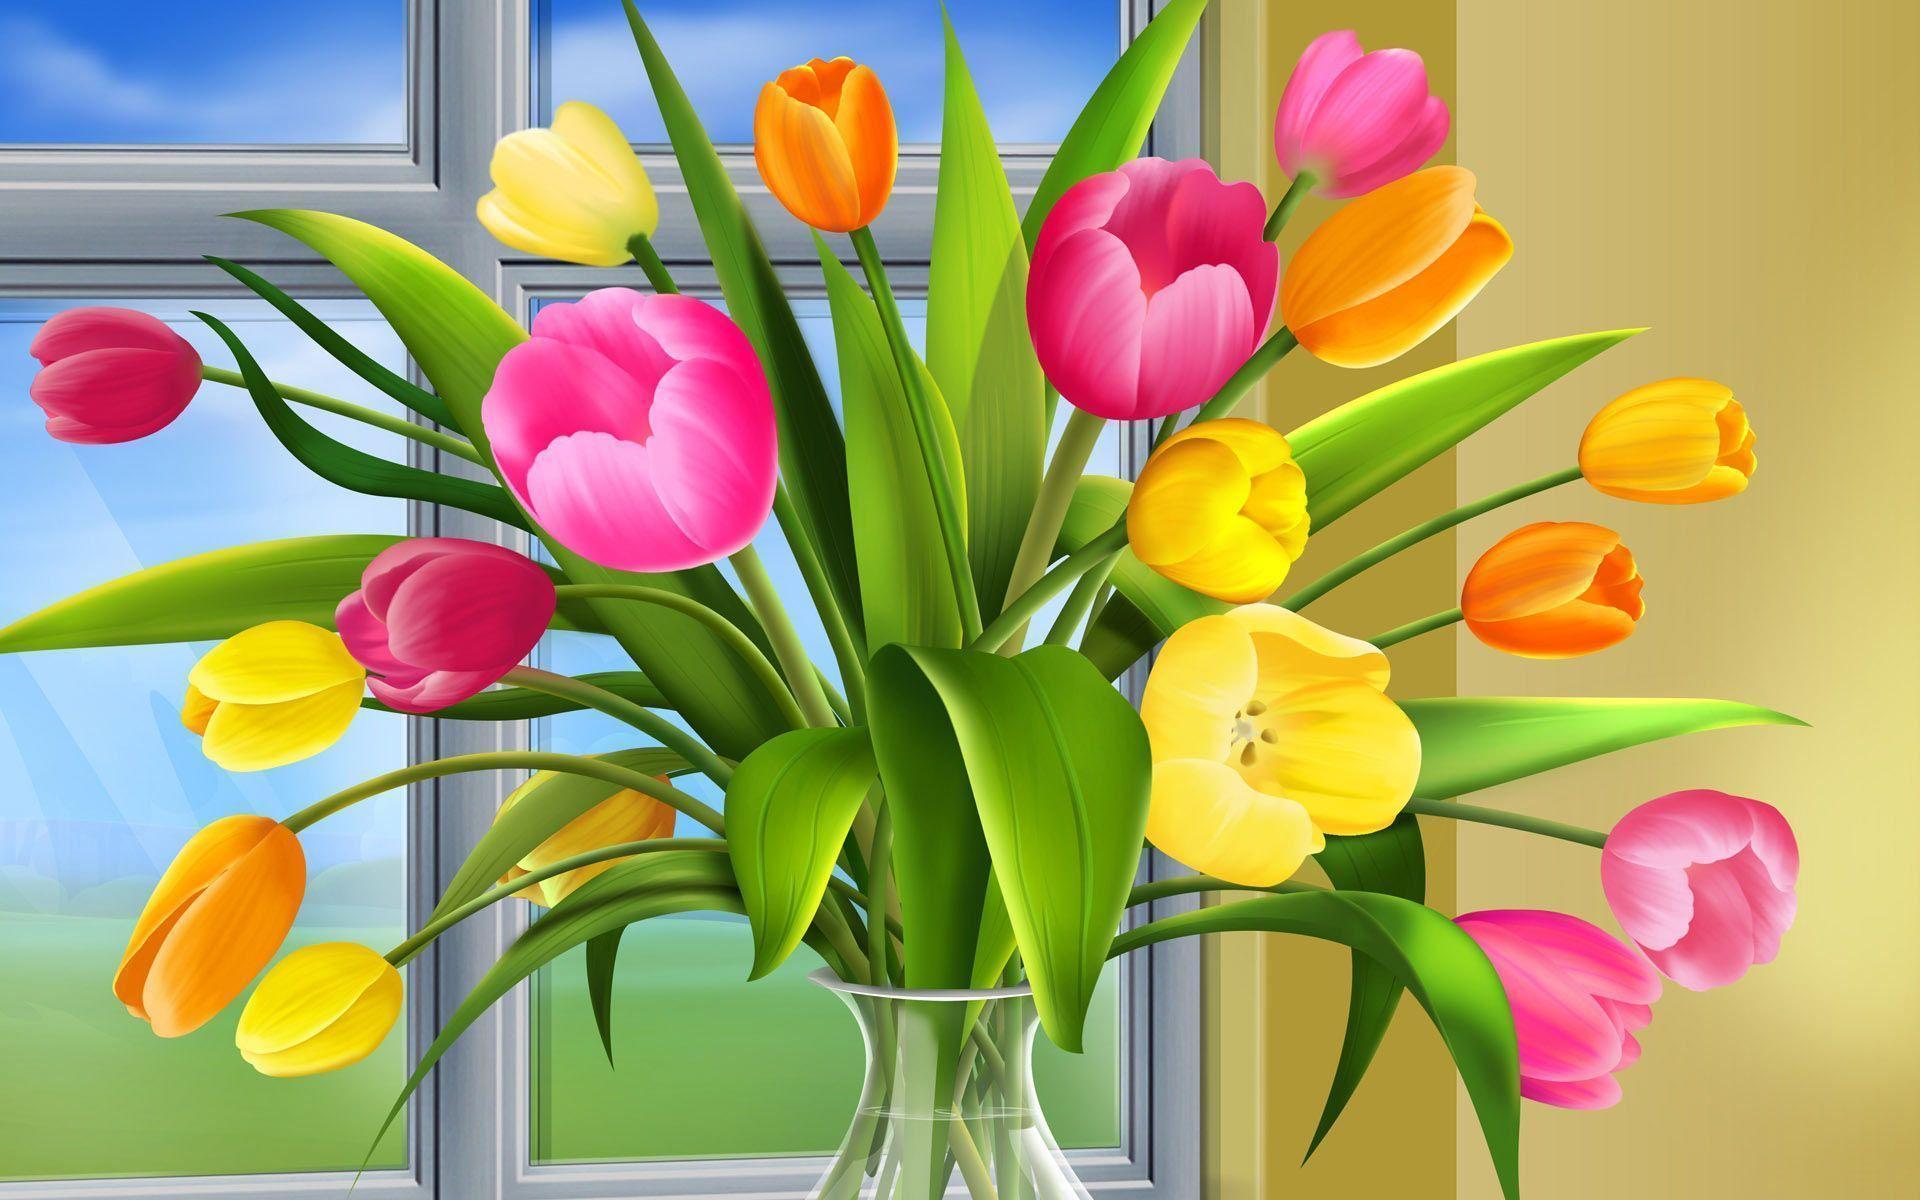 Spring Screensavers Wallpapers - Wallpaper Cave